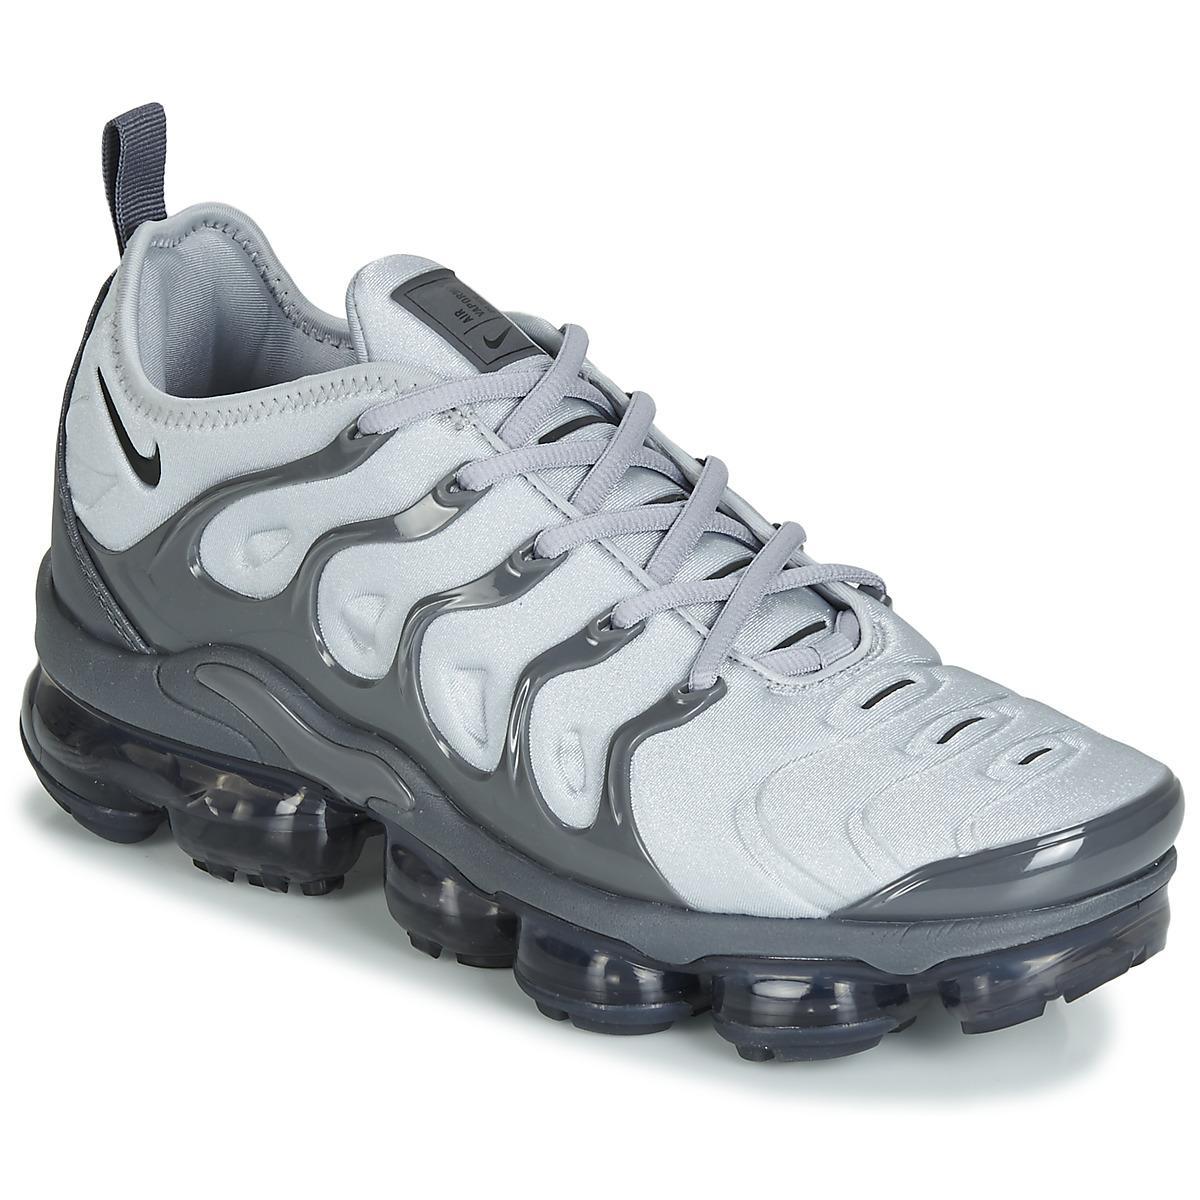 8b61ef2c369 Nike Cross Brand Men39s Shoe VaporMax Plus Shoes t